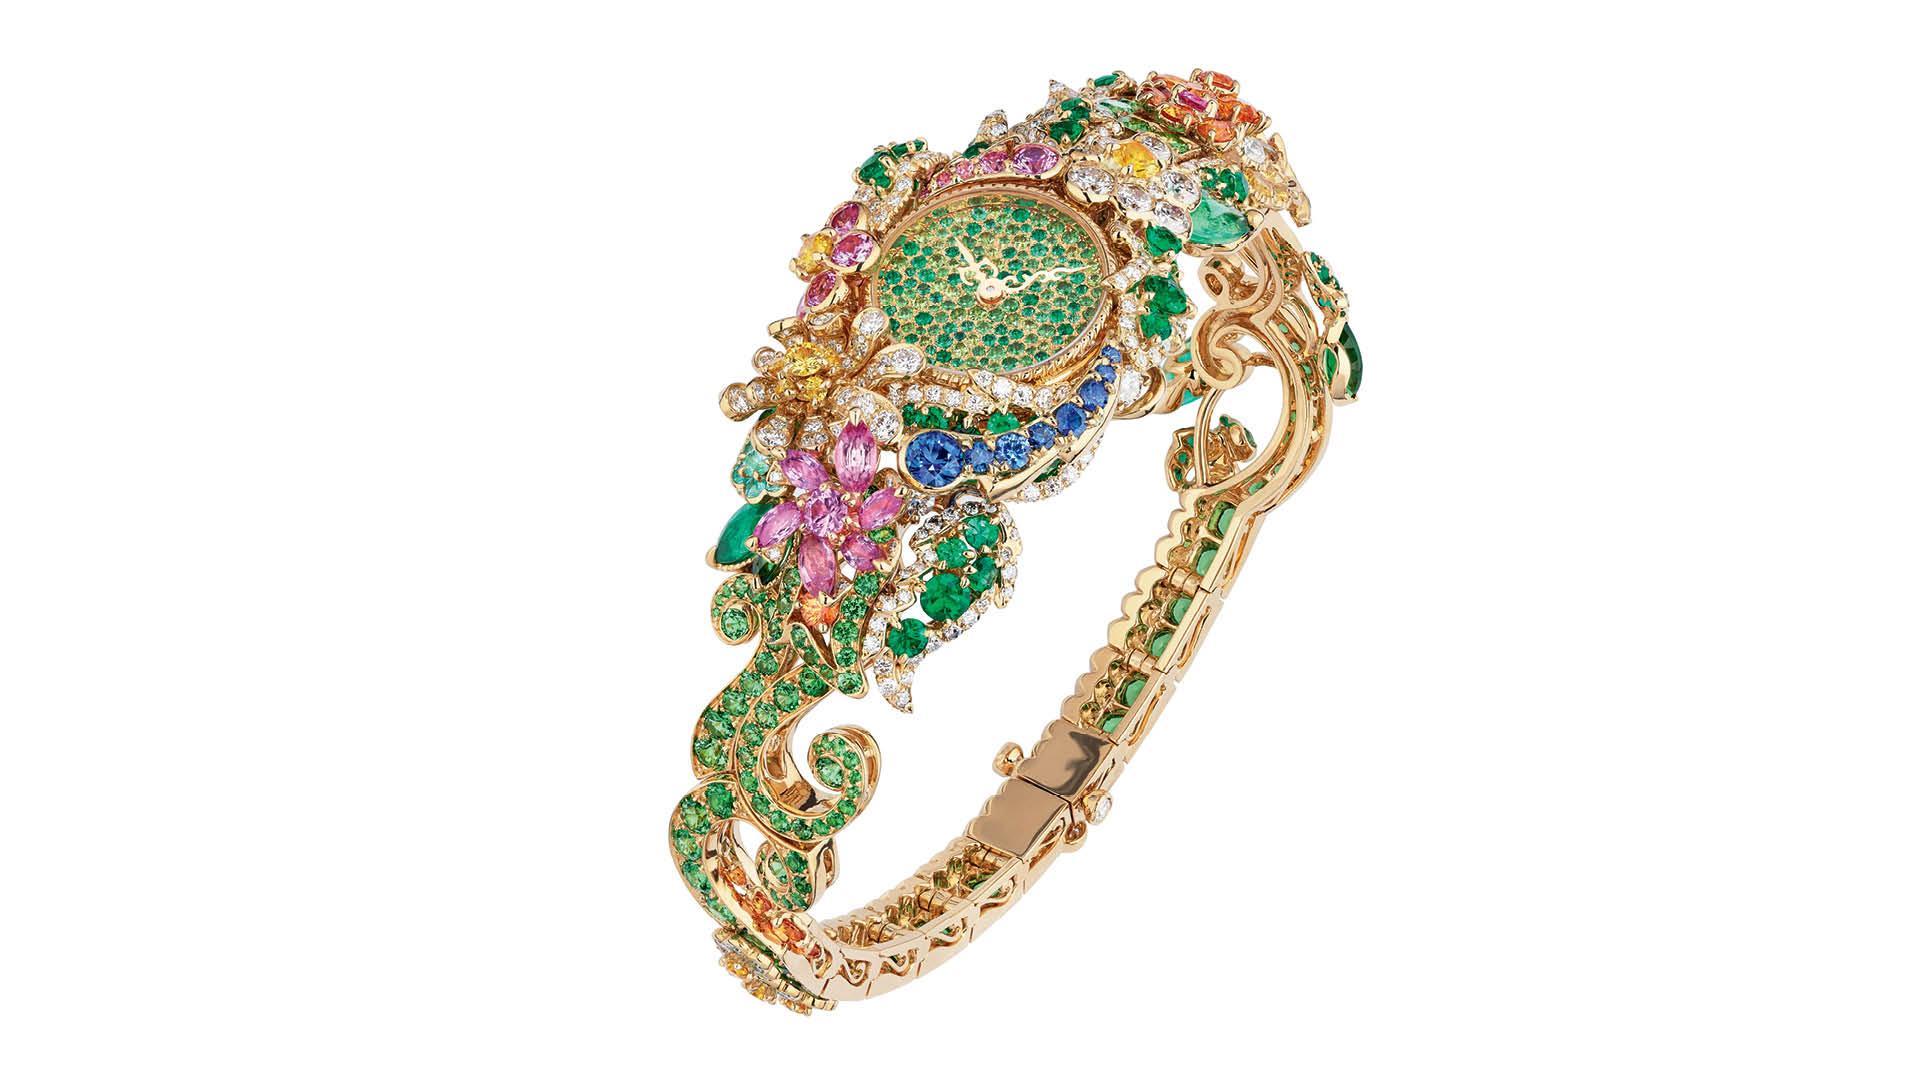 Dior High Jewellery Timepiece